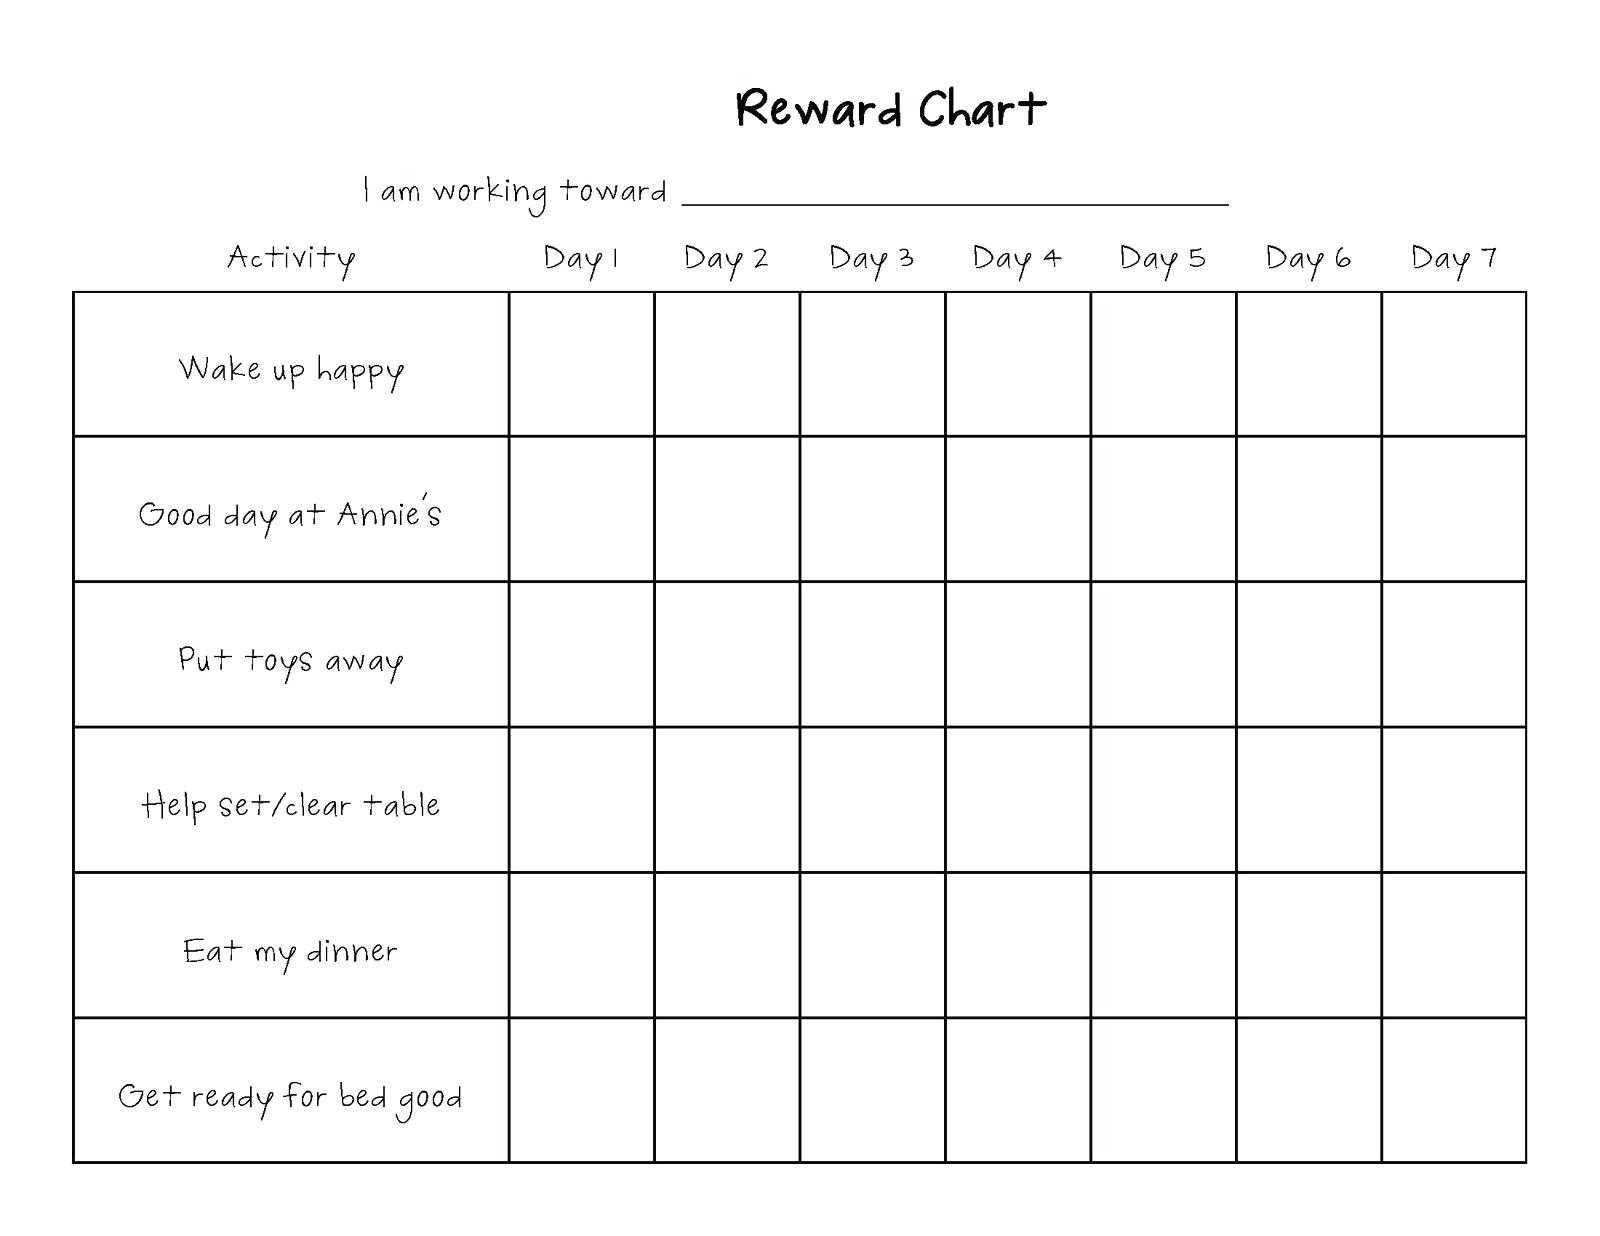 Printable Blank Chore Chart Template – Wovensheet.co inside Blank Reward Chart Template